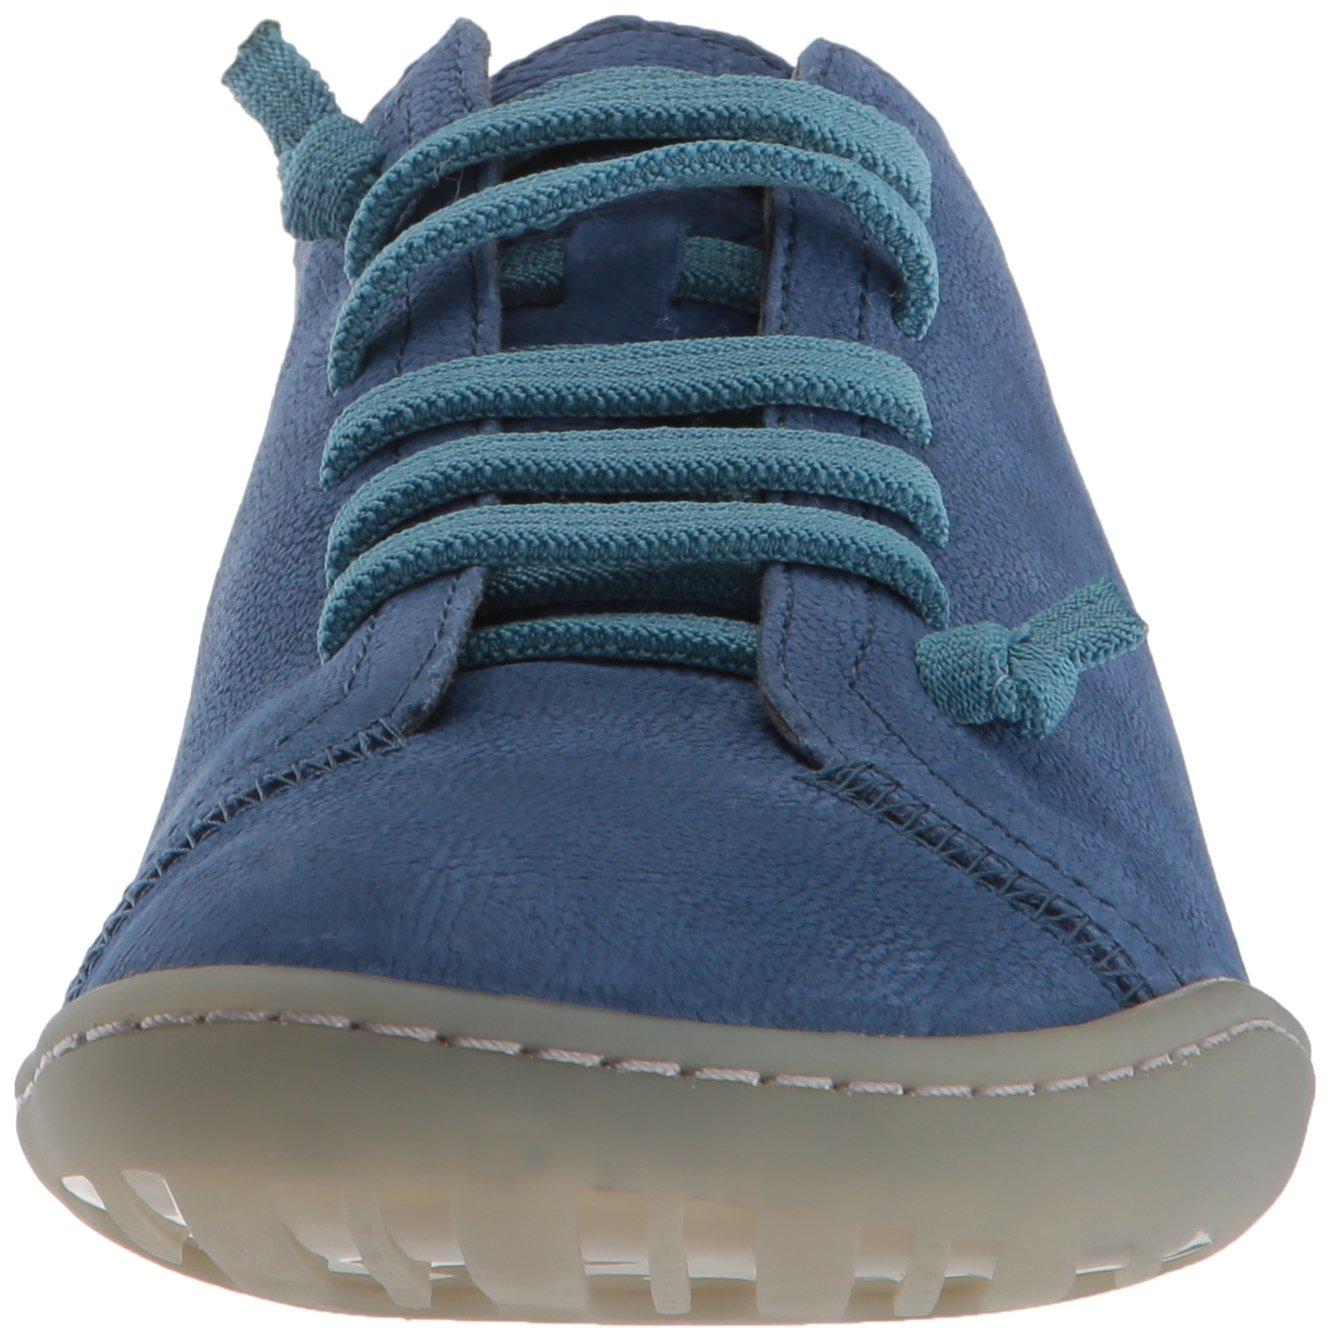 Camper Womens Peu Sneaker Cami 20848 B0746yjwhp 41 M Eu Vionic Kea Navy Wanita 11 Us